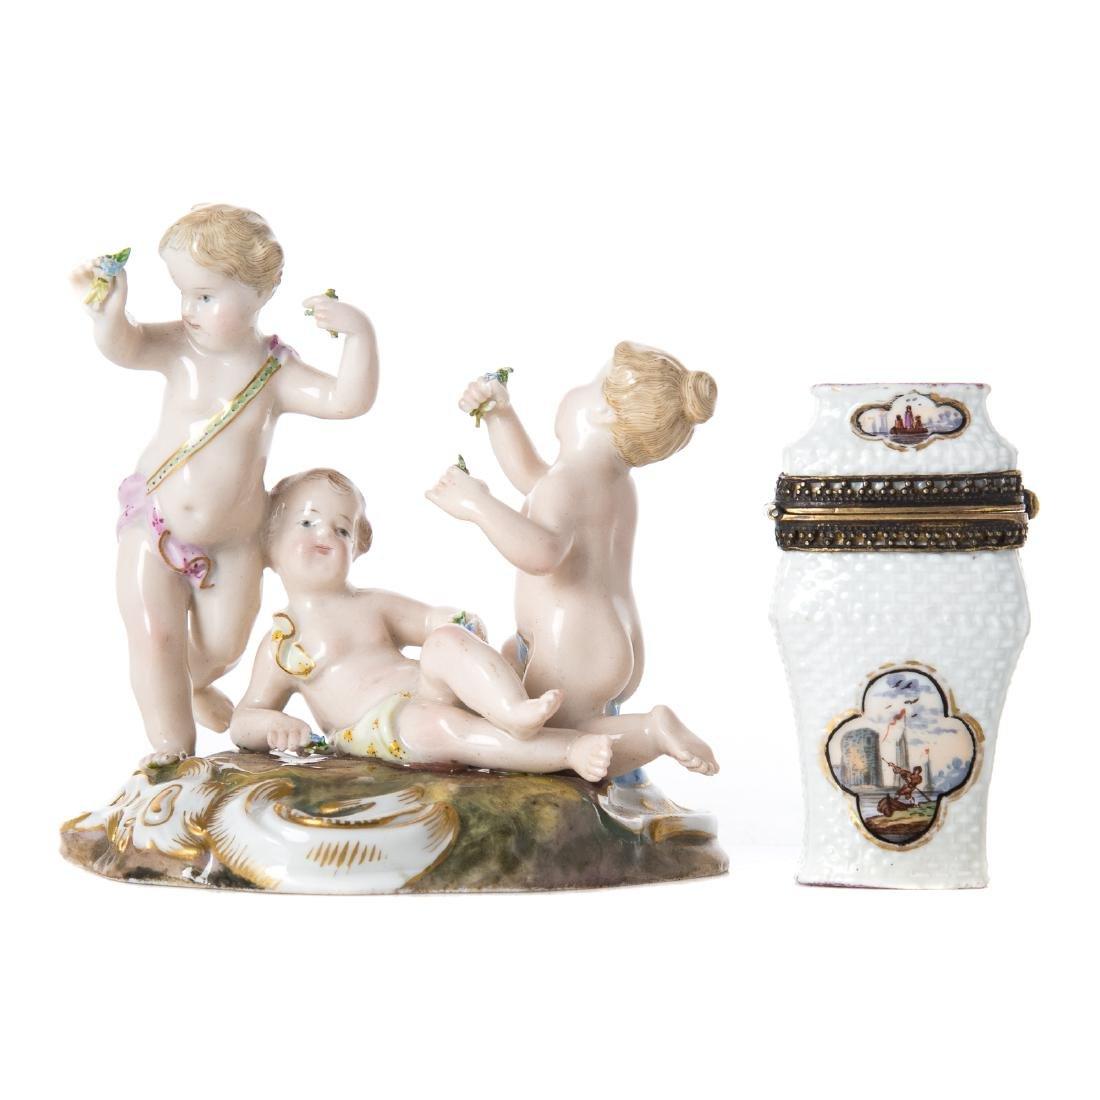 Meissen porcelain figural group and match safe